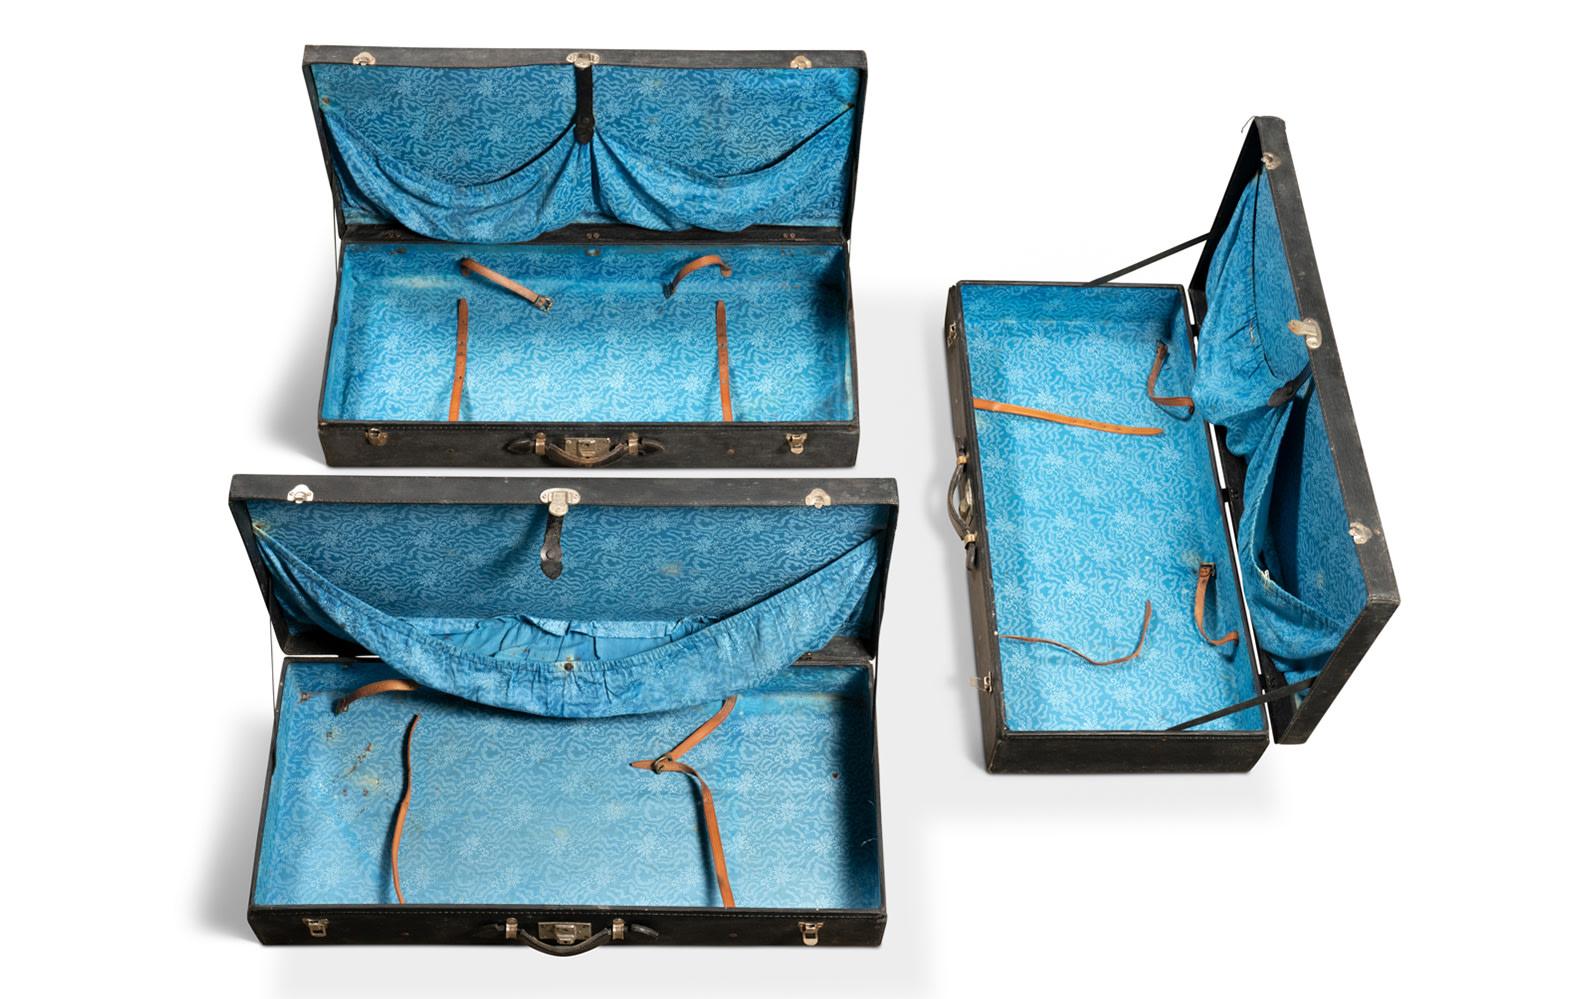 Three-Piece Long-Grain Motoring Luggage Set